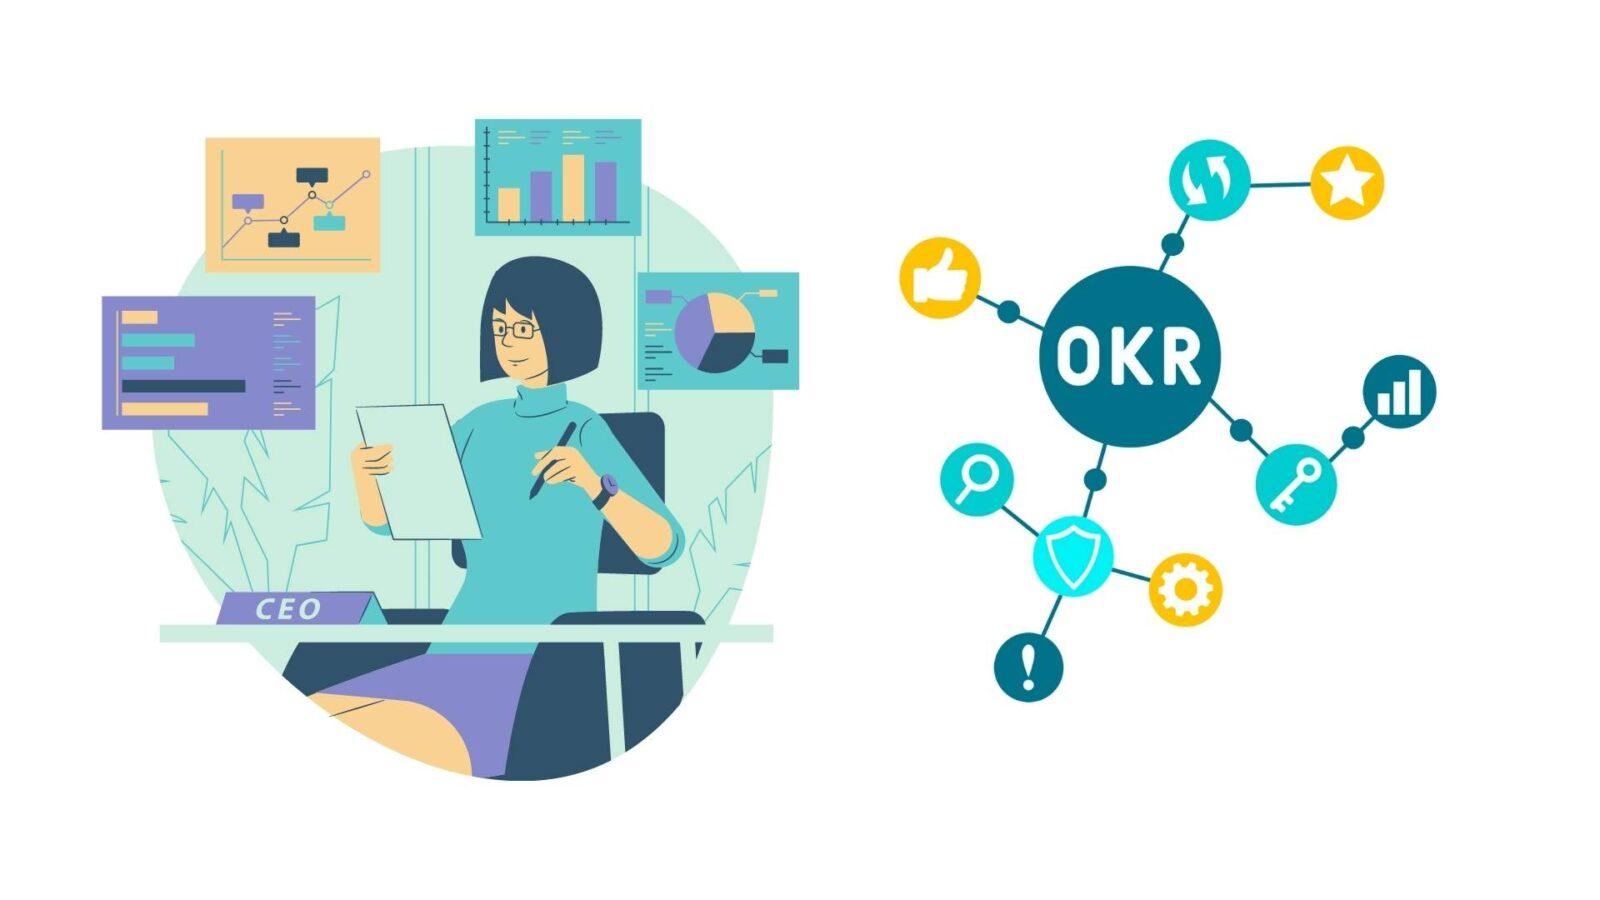 company okr